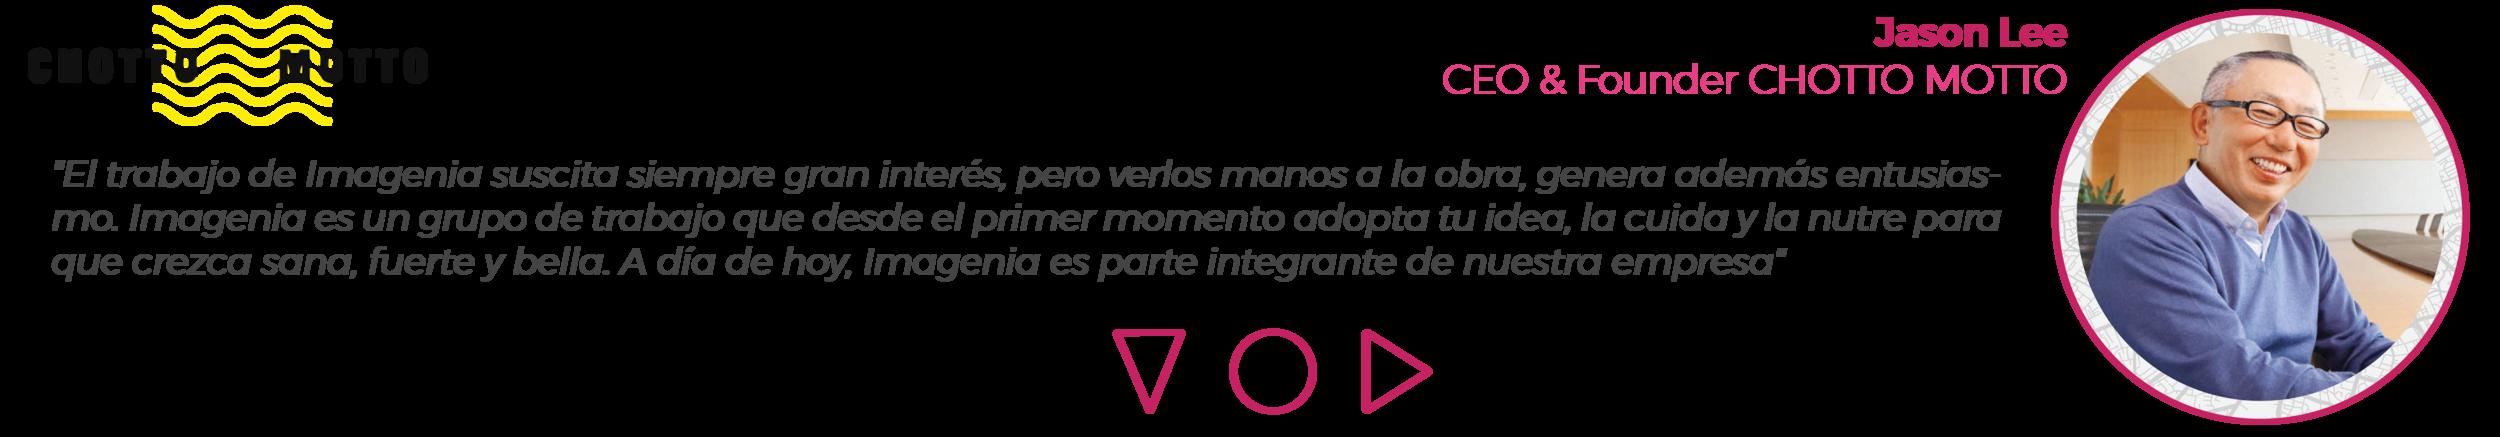 recomendaciones clientes_web_IMAGENIA__CHOTTO MOTTO.png